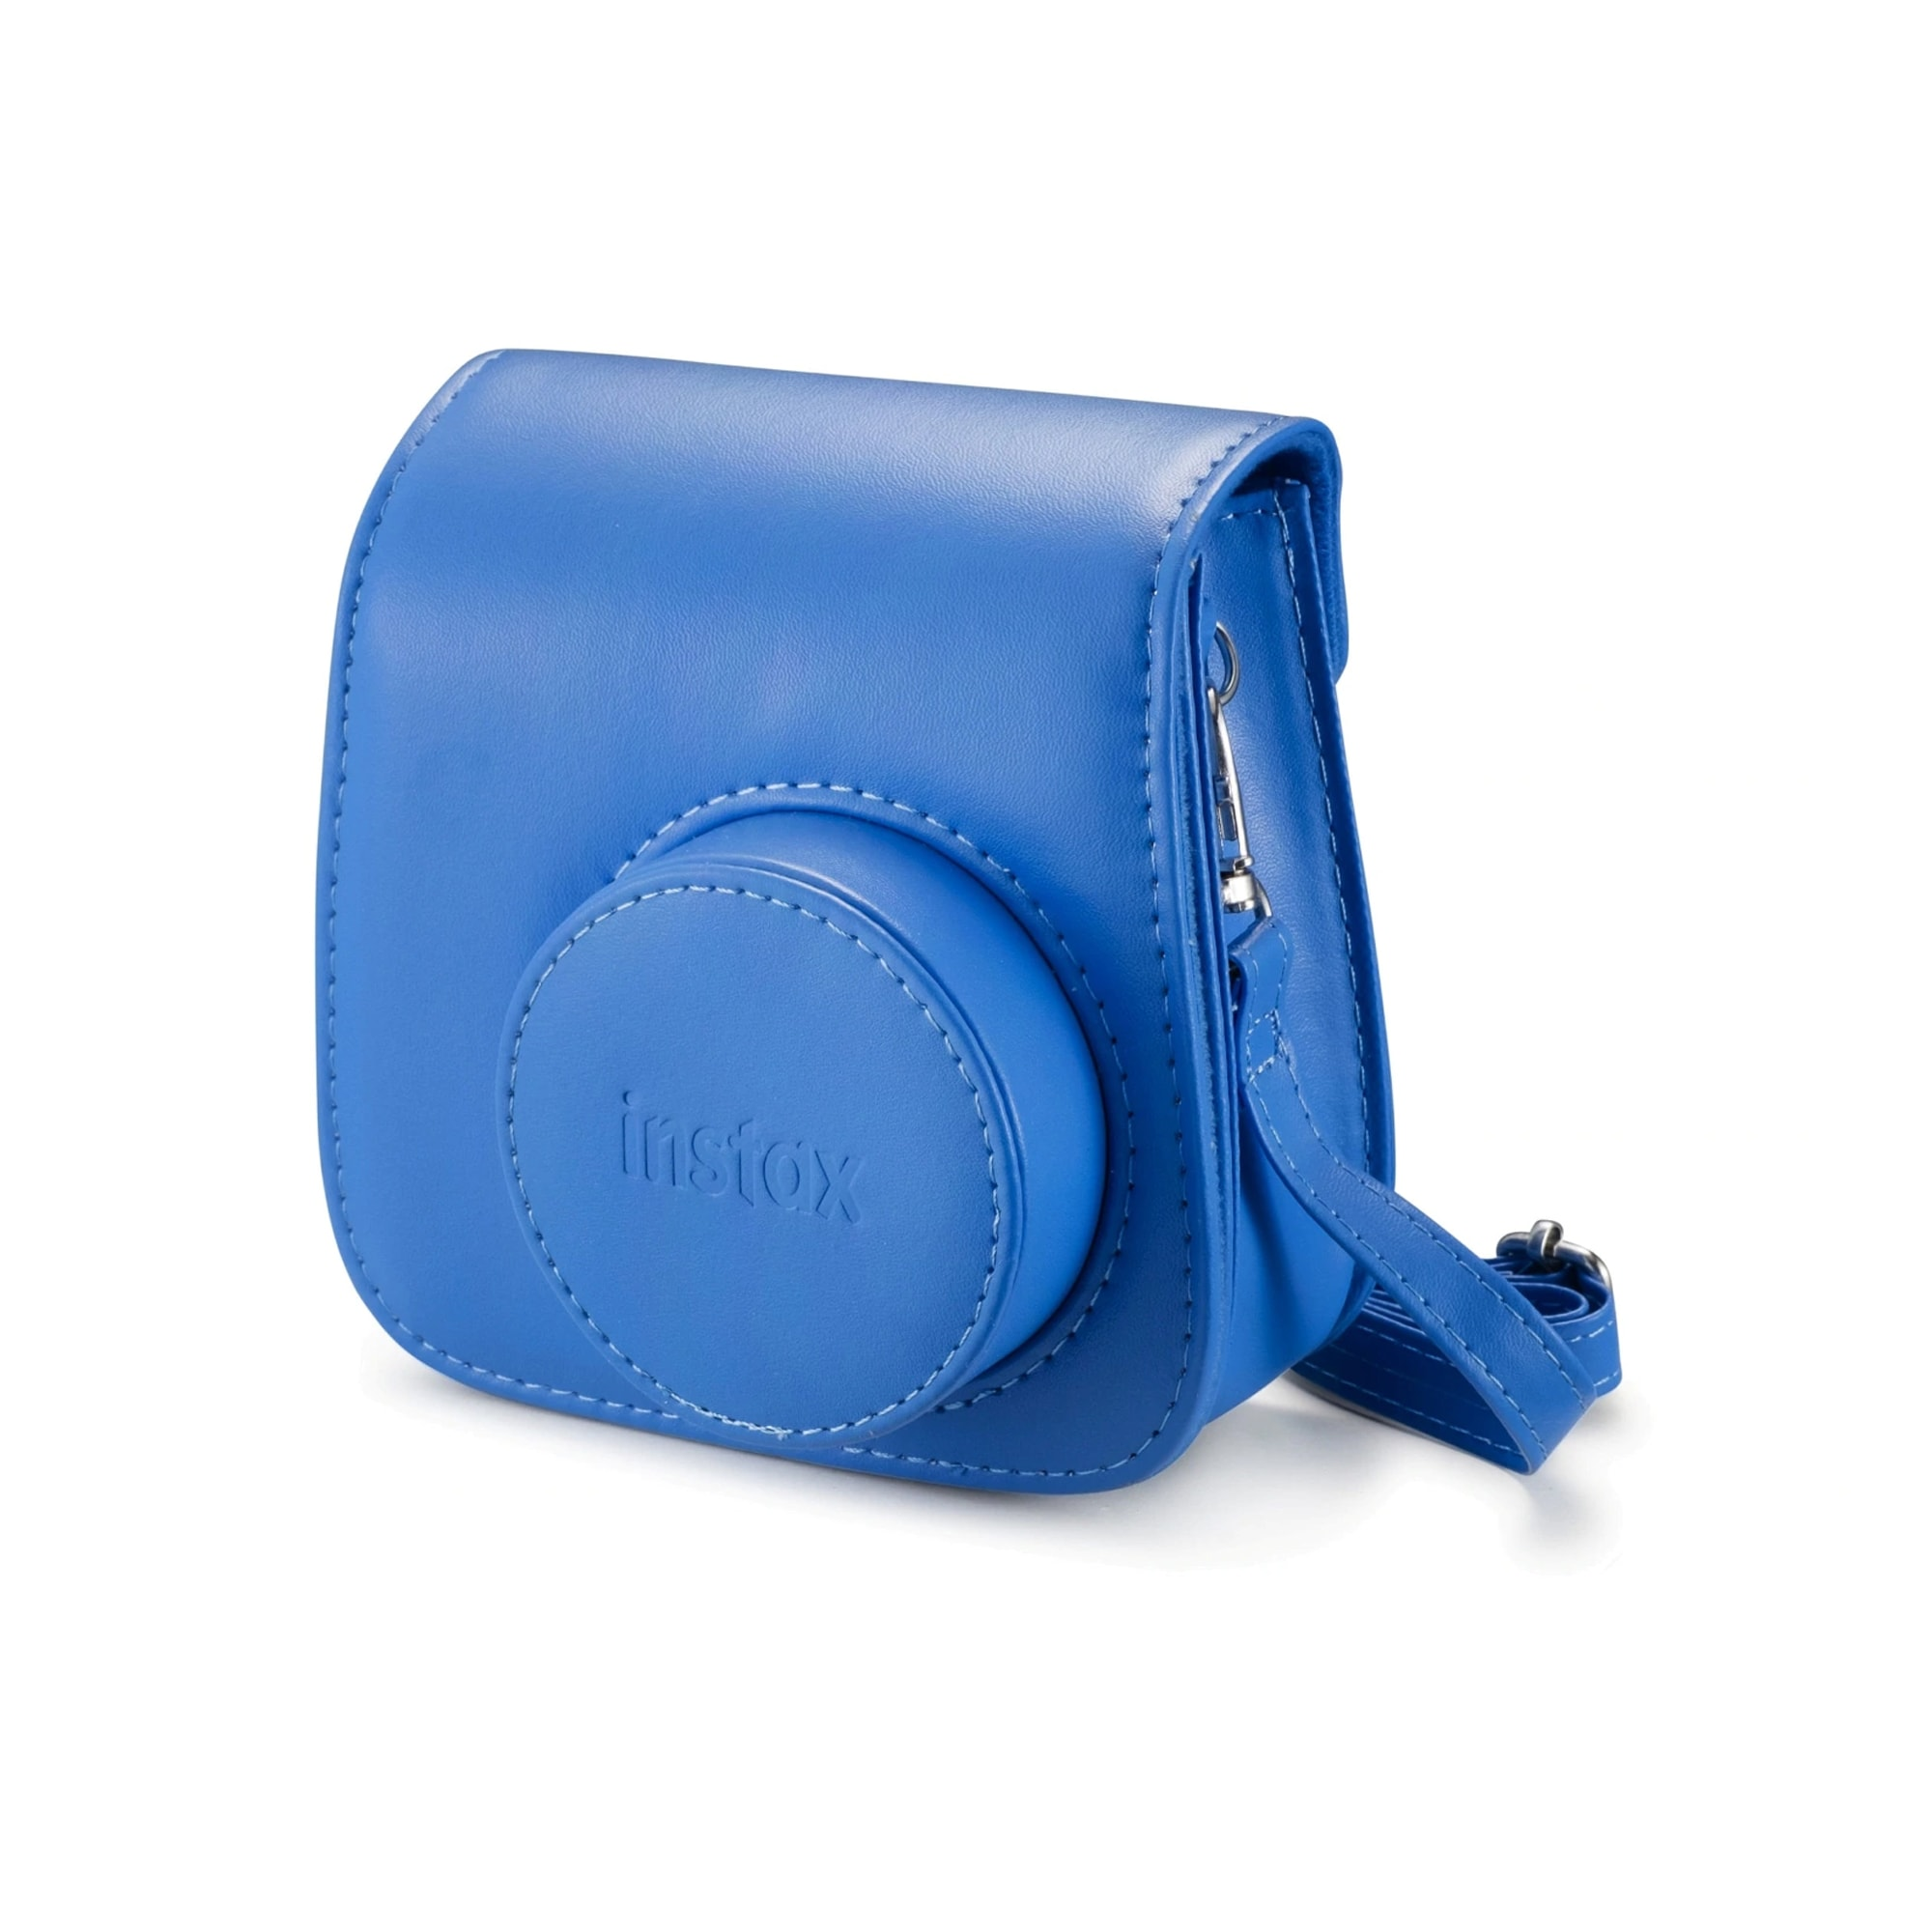 Fujifilm Instax Mini 9 Väska Cobolt Blå